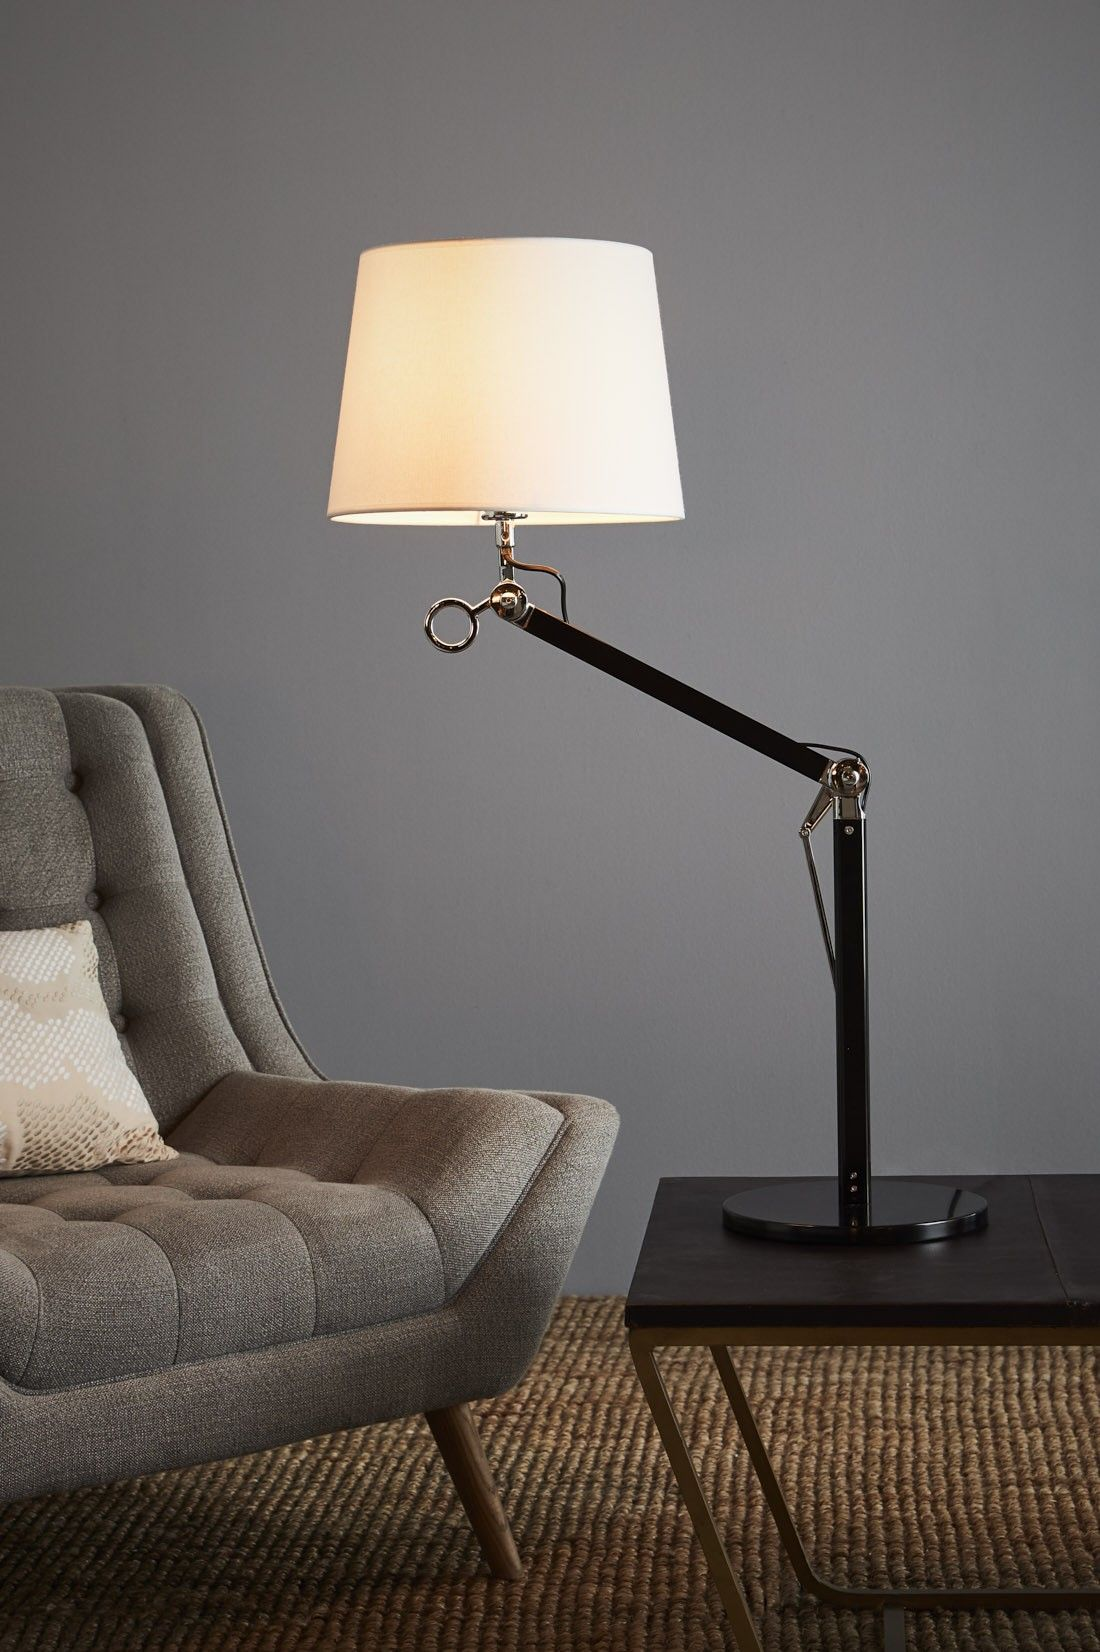 Lumino Small Table Lamp Black/White 349 D24 x